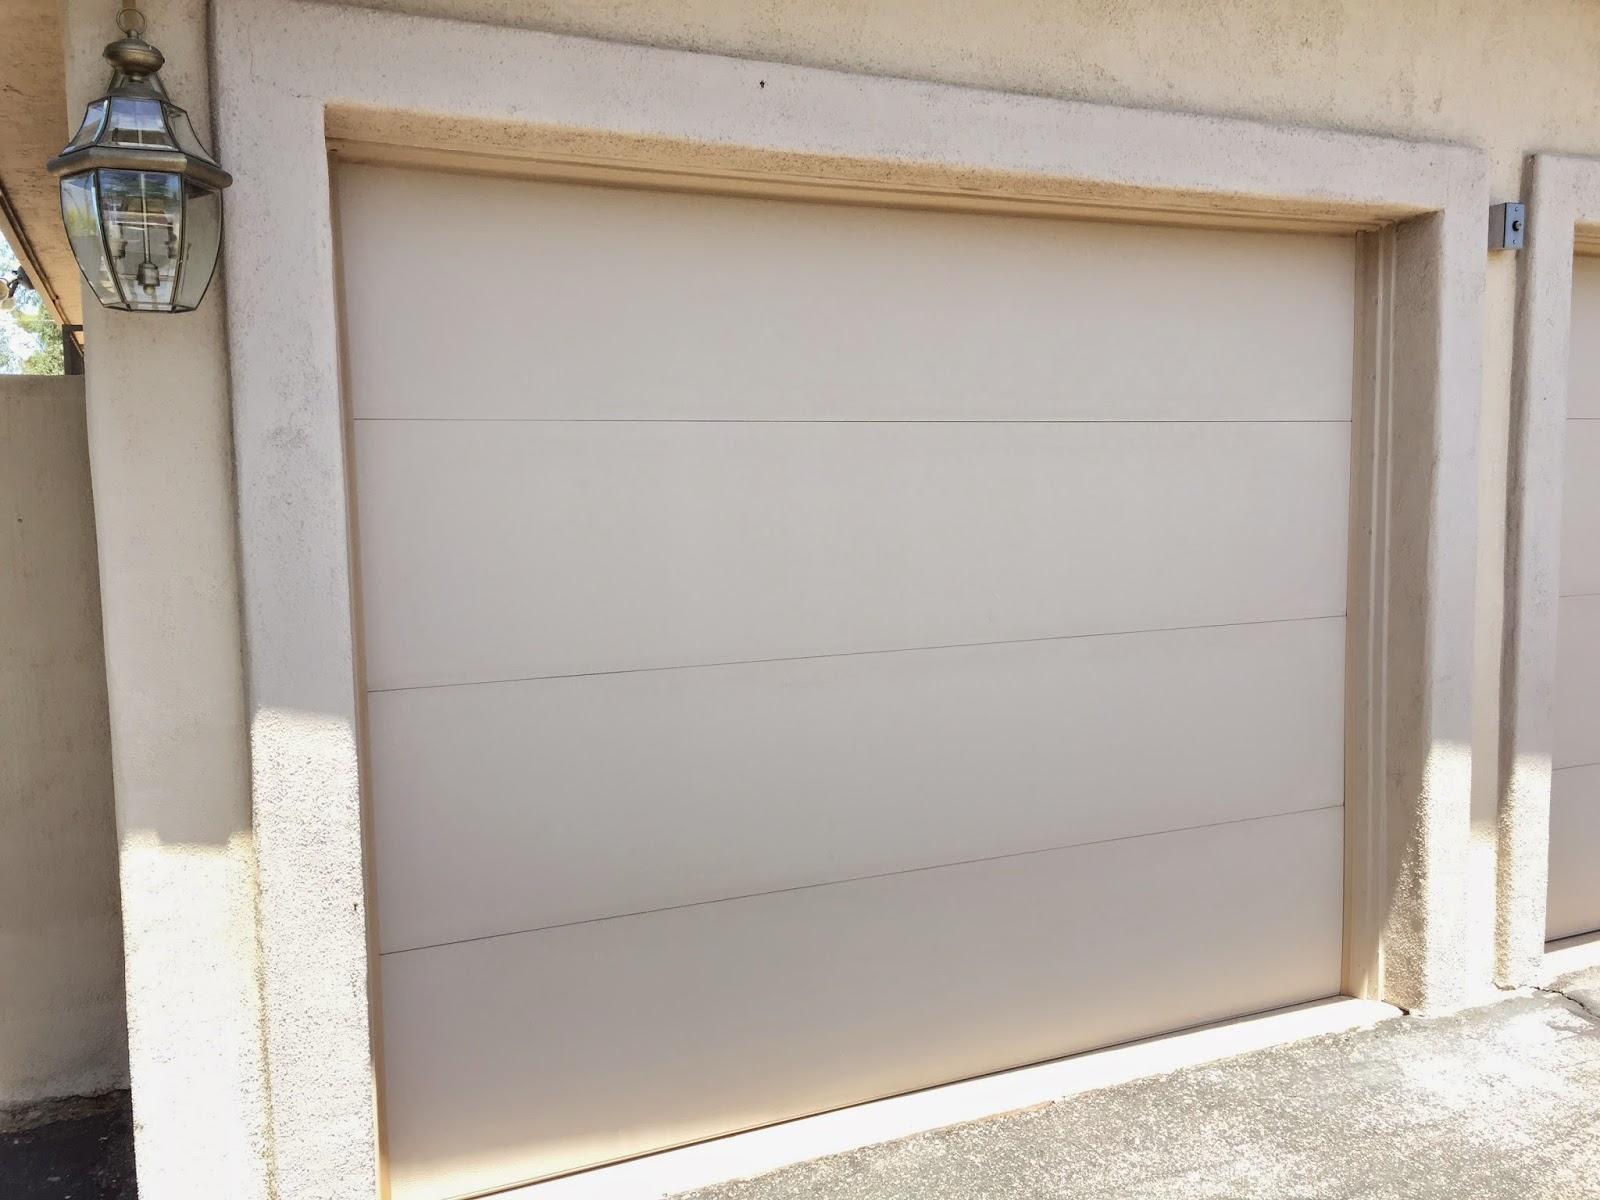 A authentic garage door 39 s rosie special rosie on the house for A authentic garage door